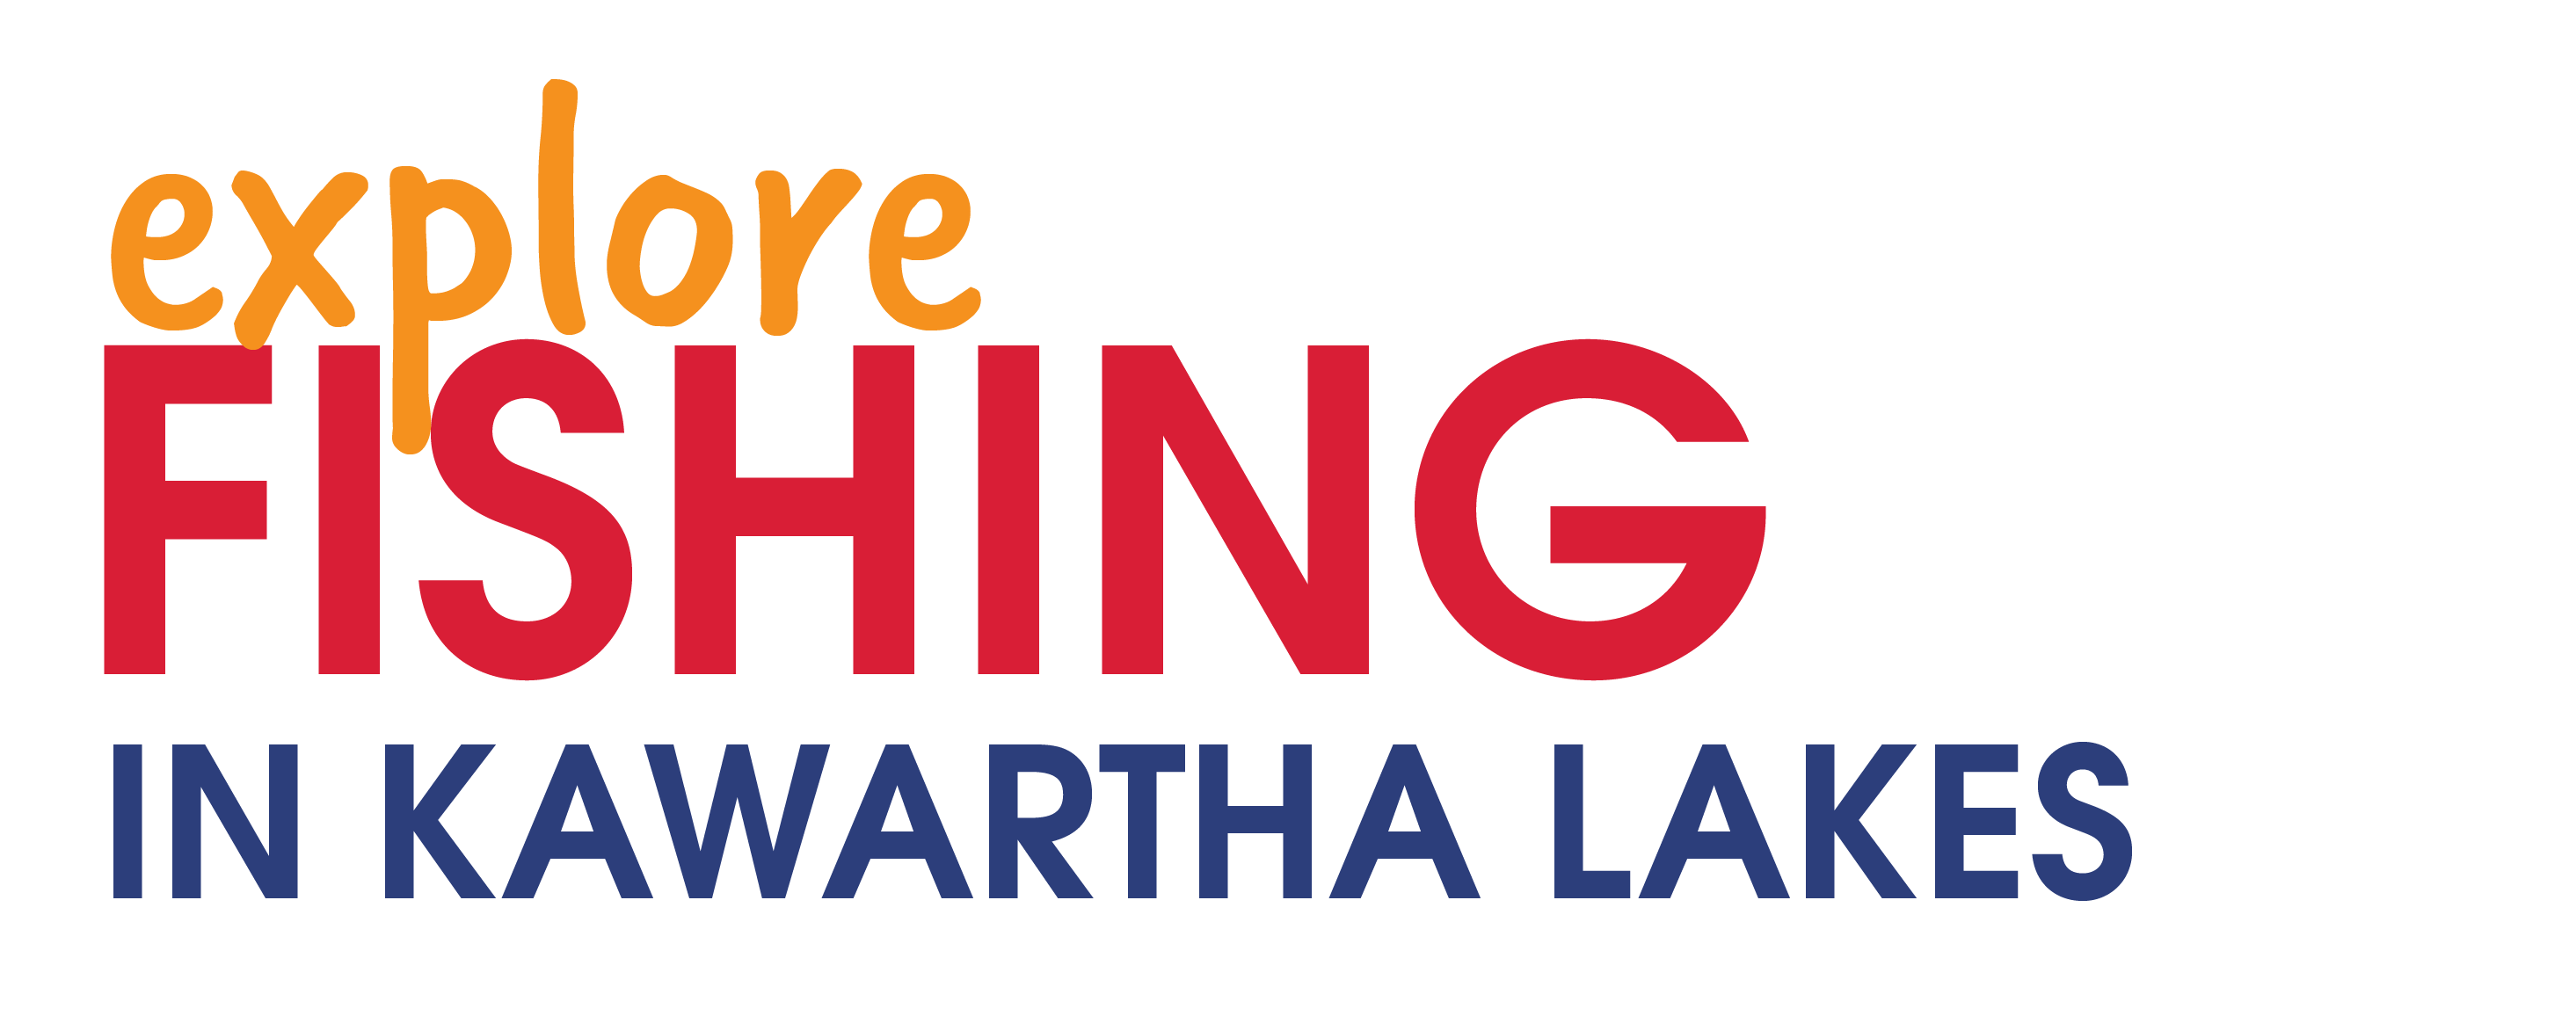 Explore Fishing in Kawartha Lakes